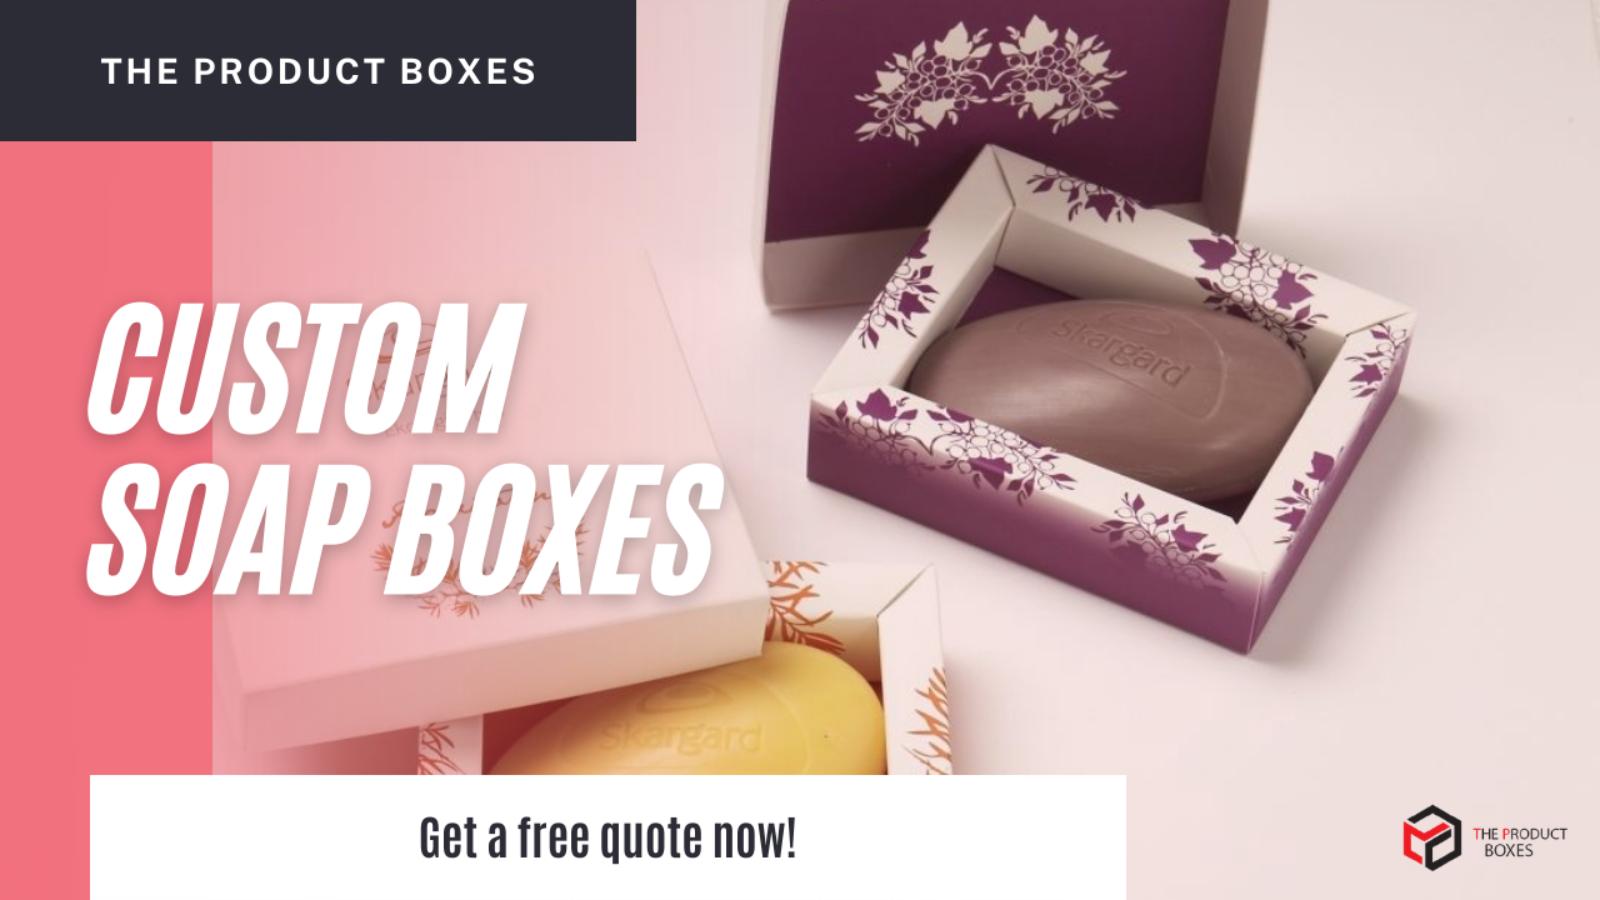 wood soap boxes